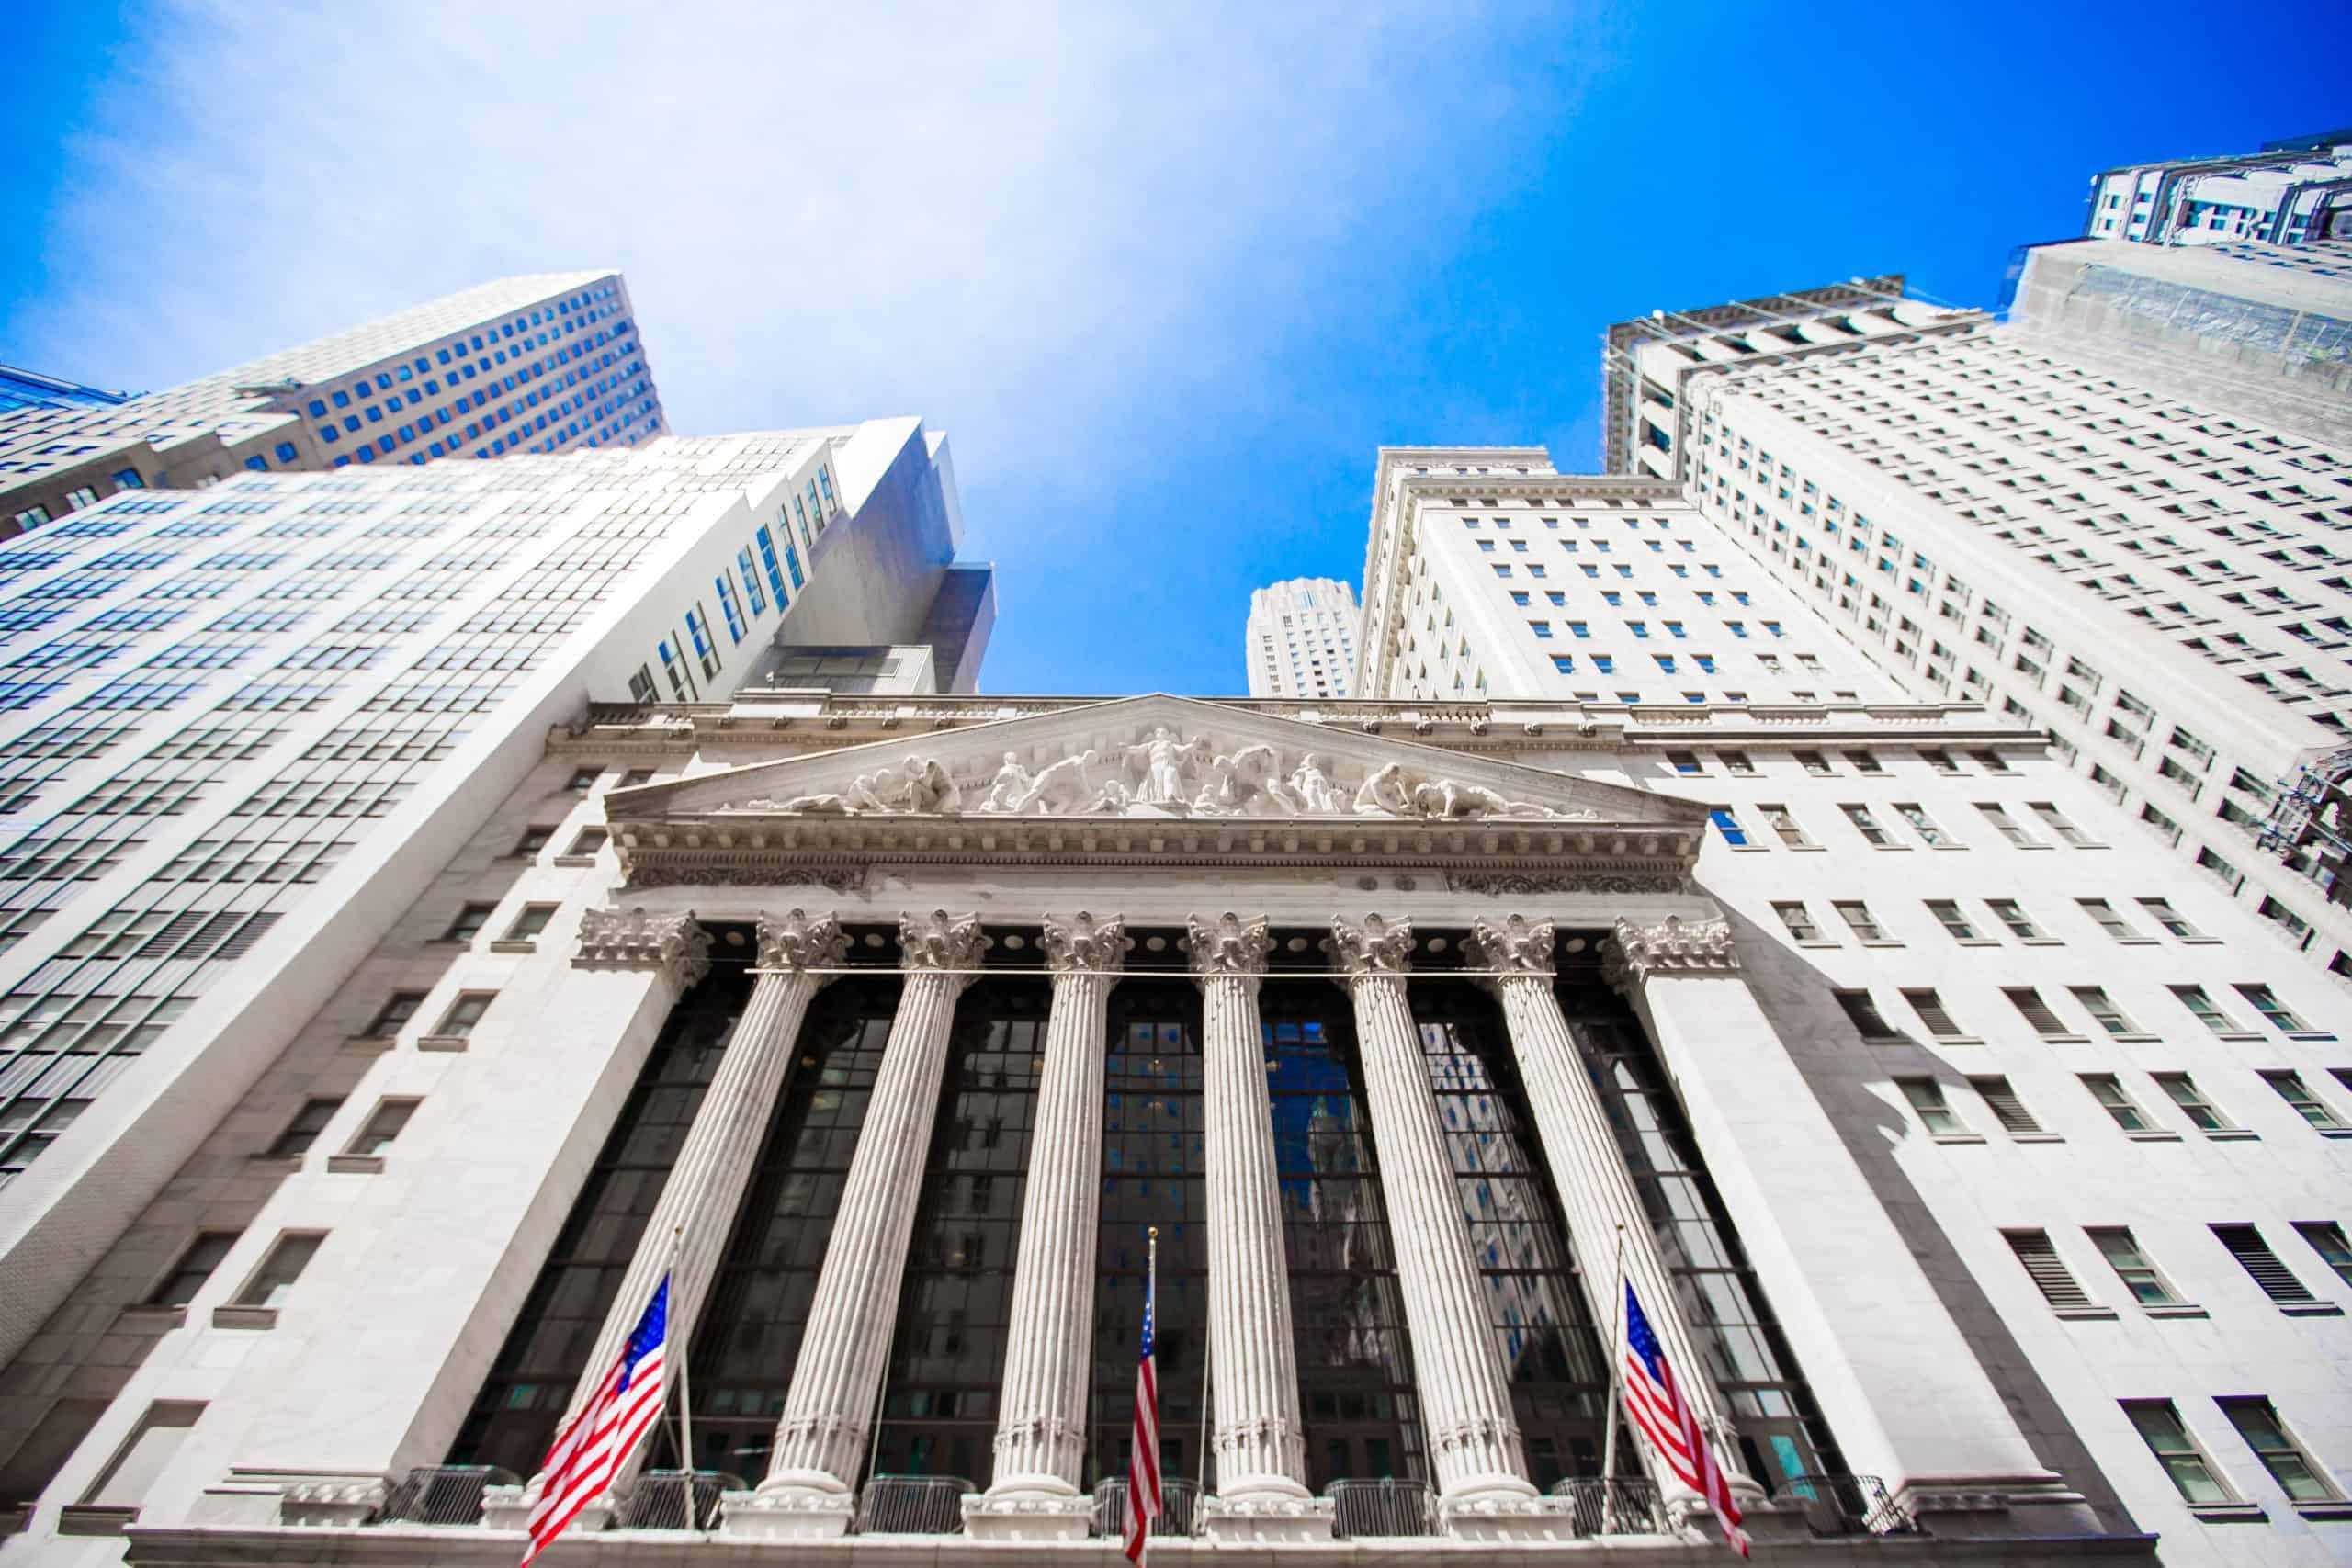 new york stock exchange in manhattan finance distr LKSLMNJ scaled